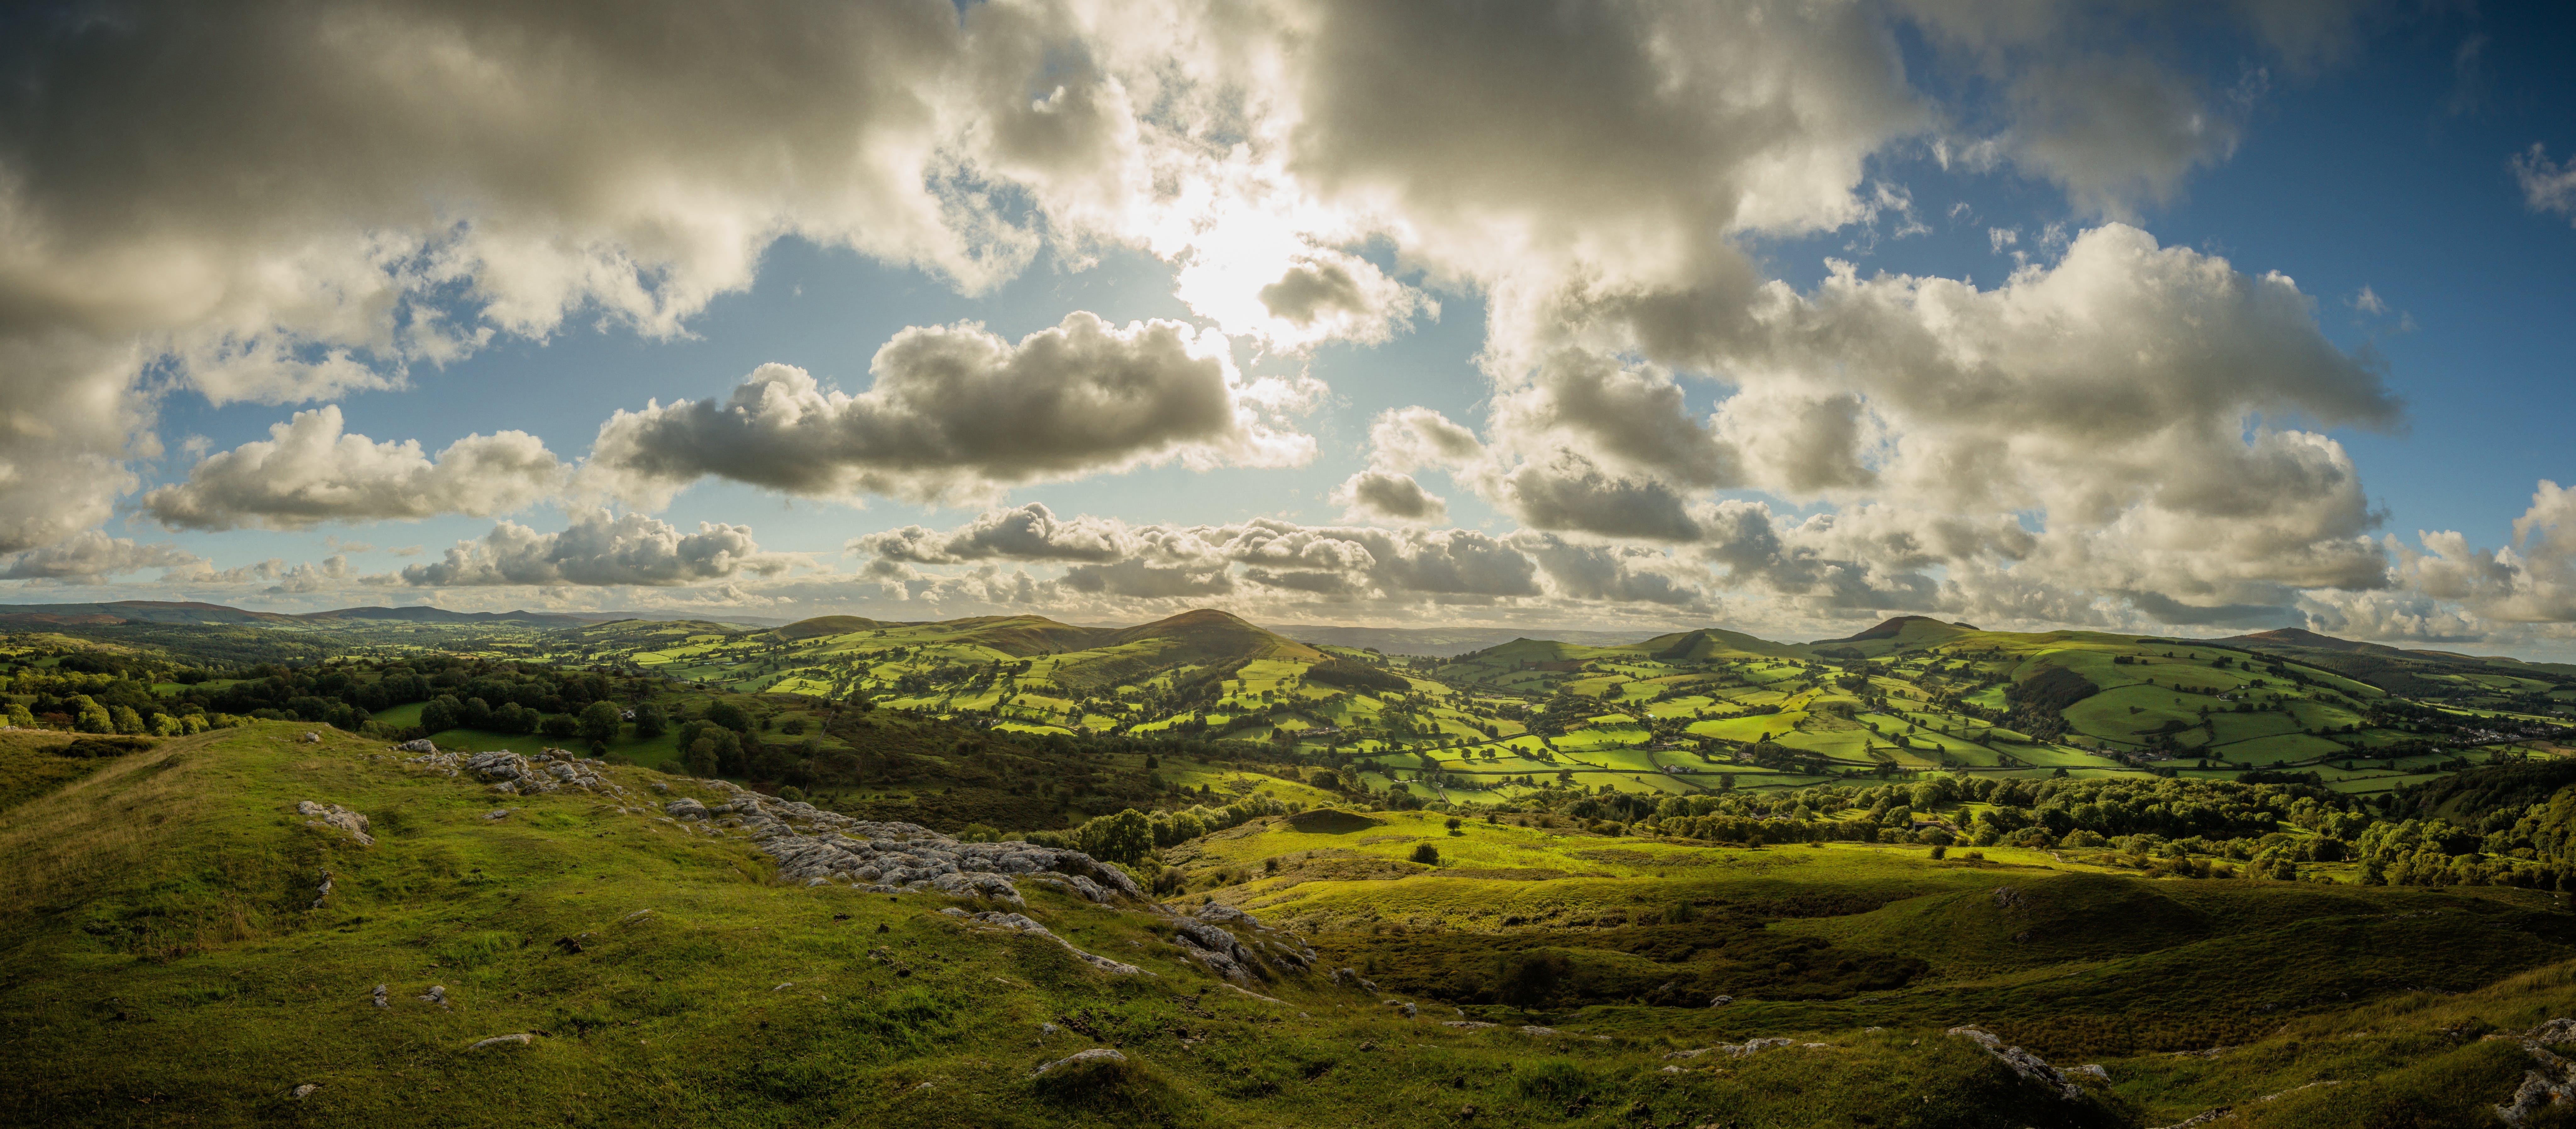 Základová fotografie zdarma na téma hřiště, krásný, malebný, mraky